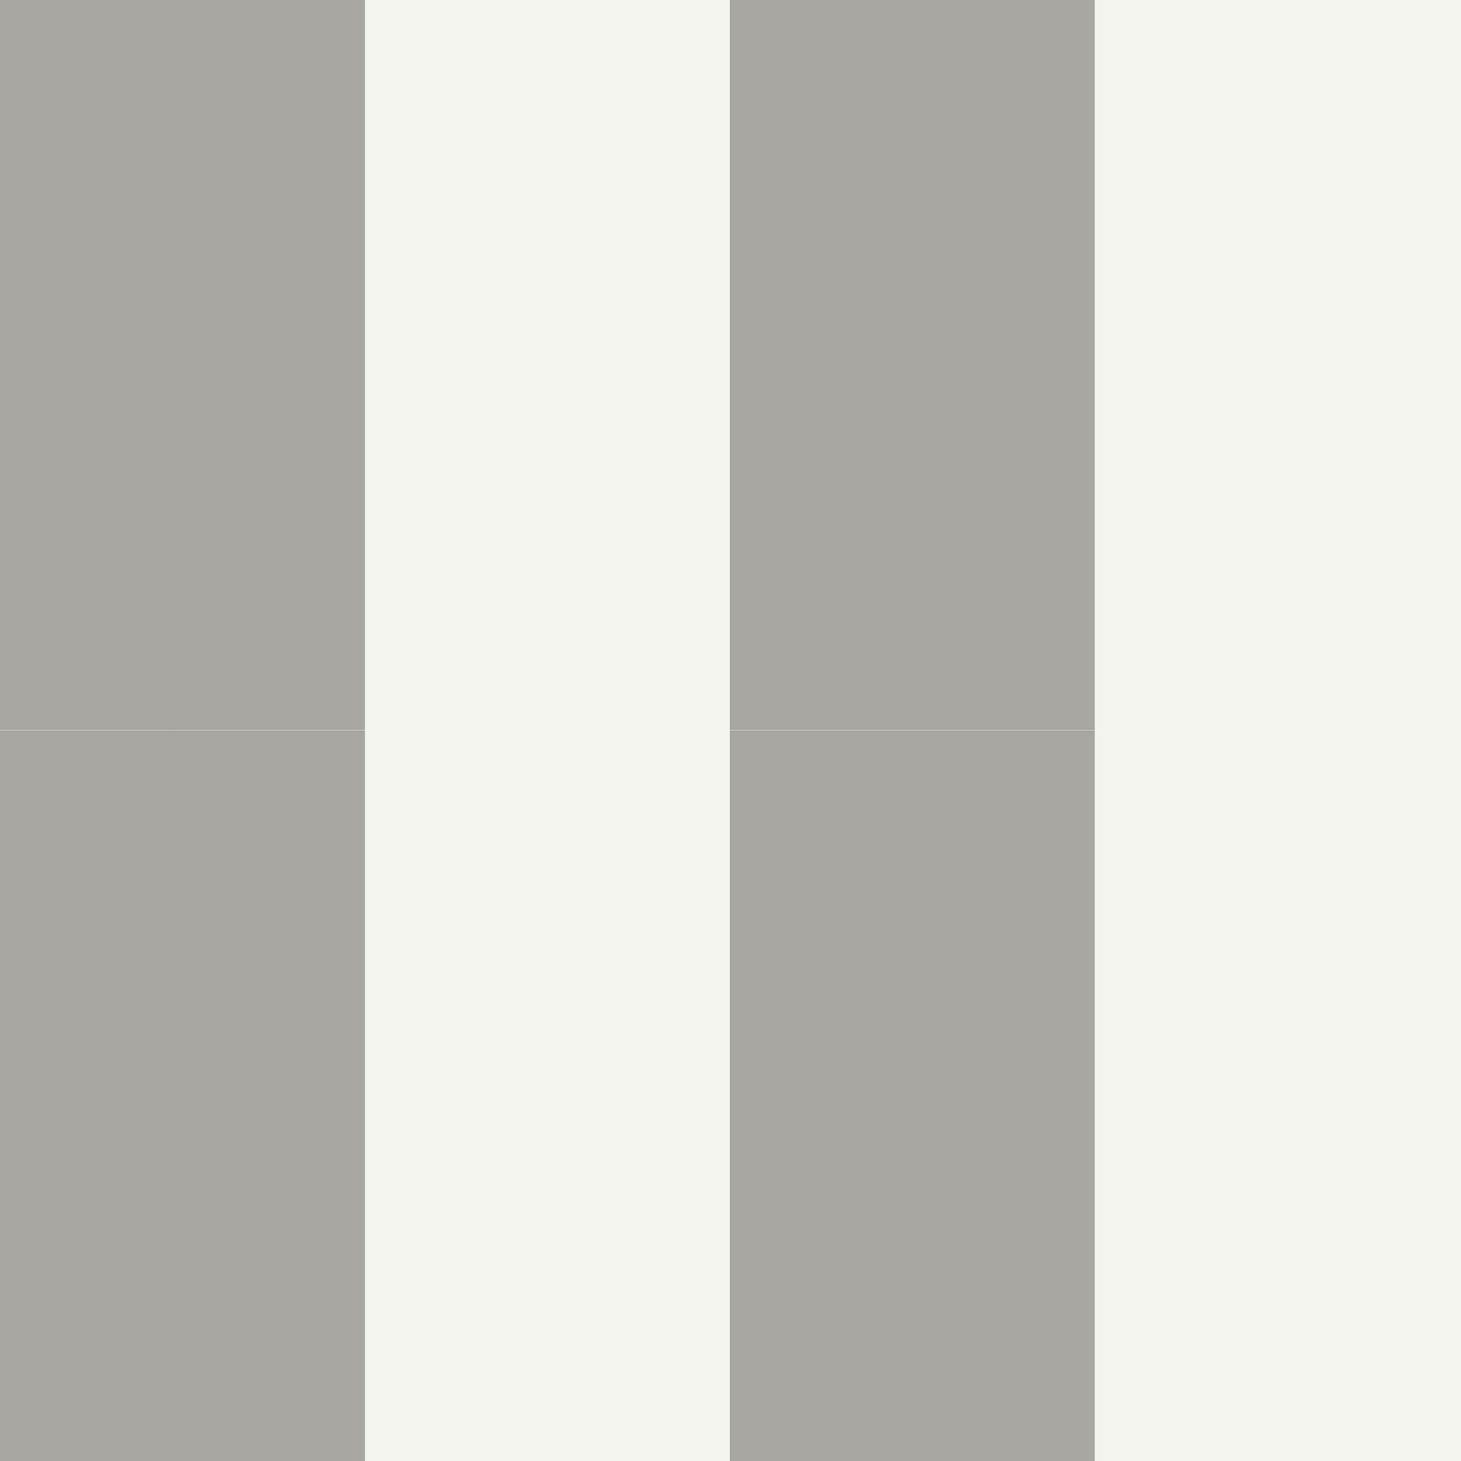 Essener Tapete Simply Stripes 3 Sy33944 grey Strisce Righe Tappezzeria in